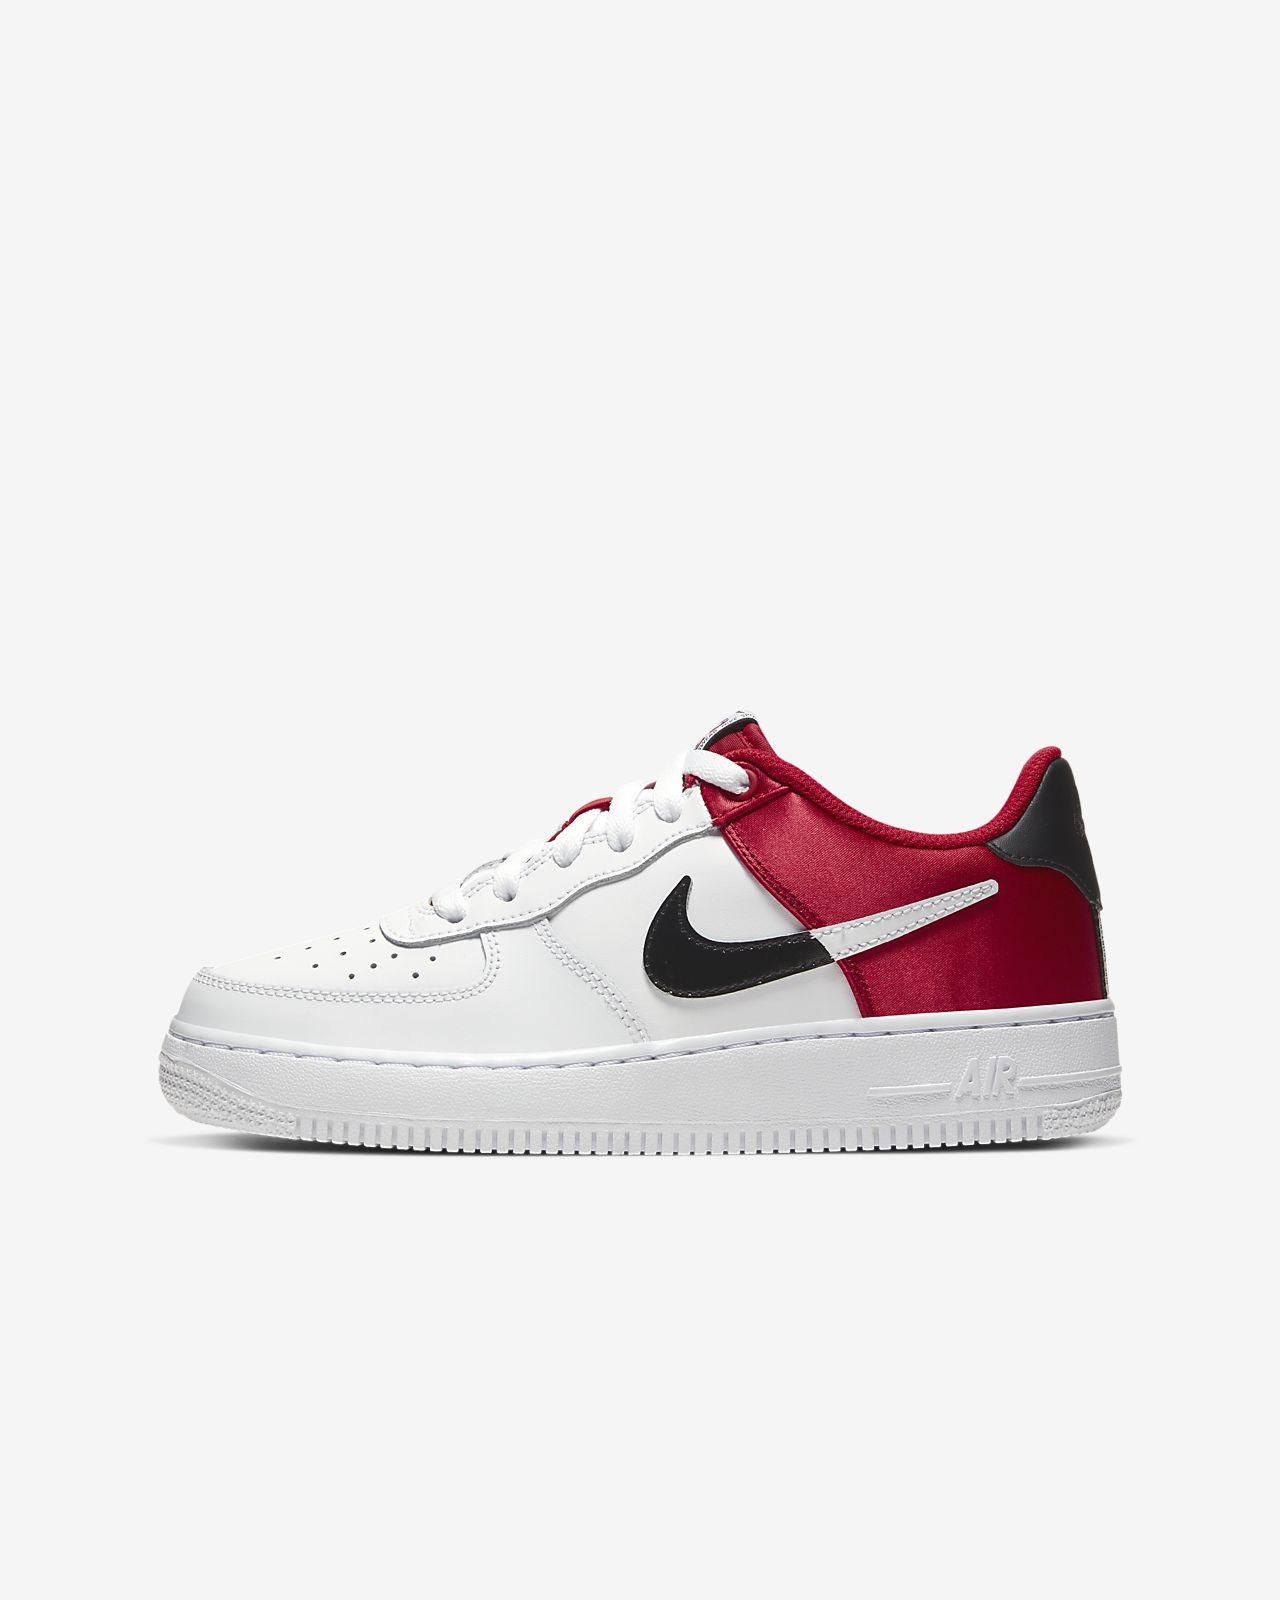 Nike Air Force 1 NBA Low Big Kids' Shoe